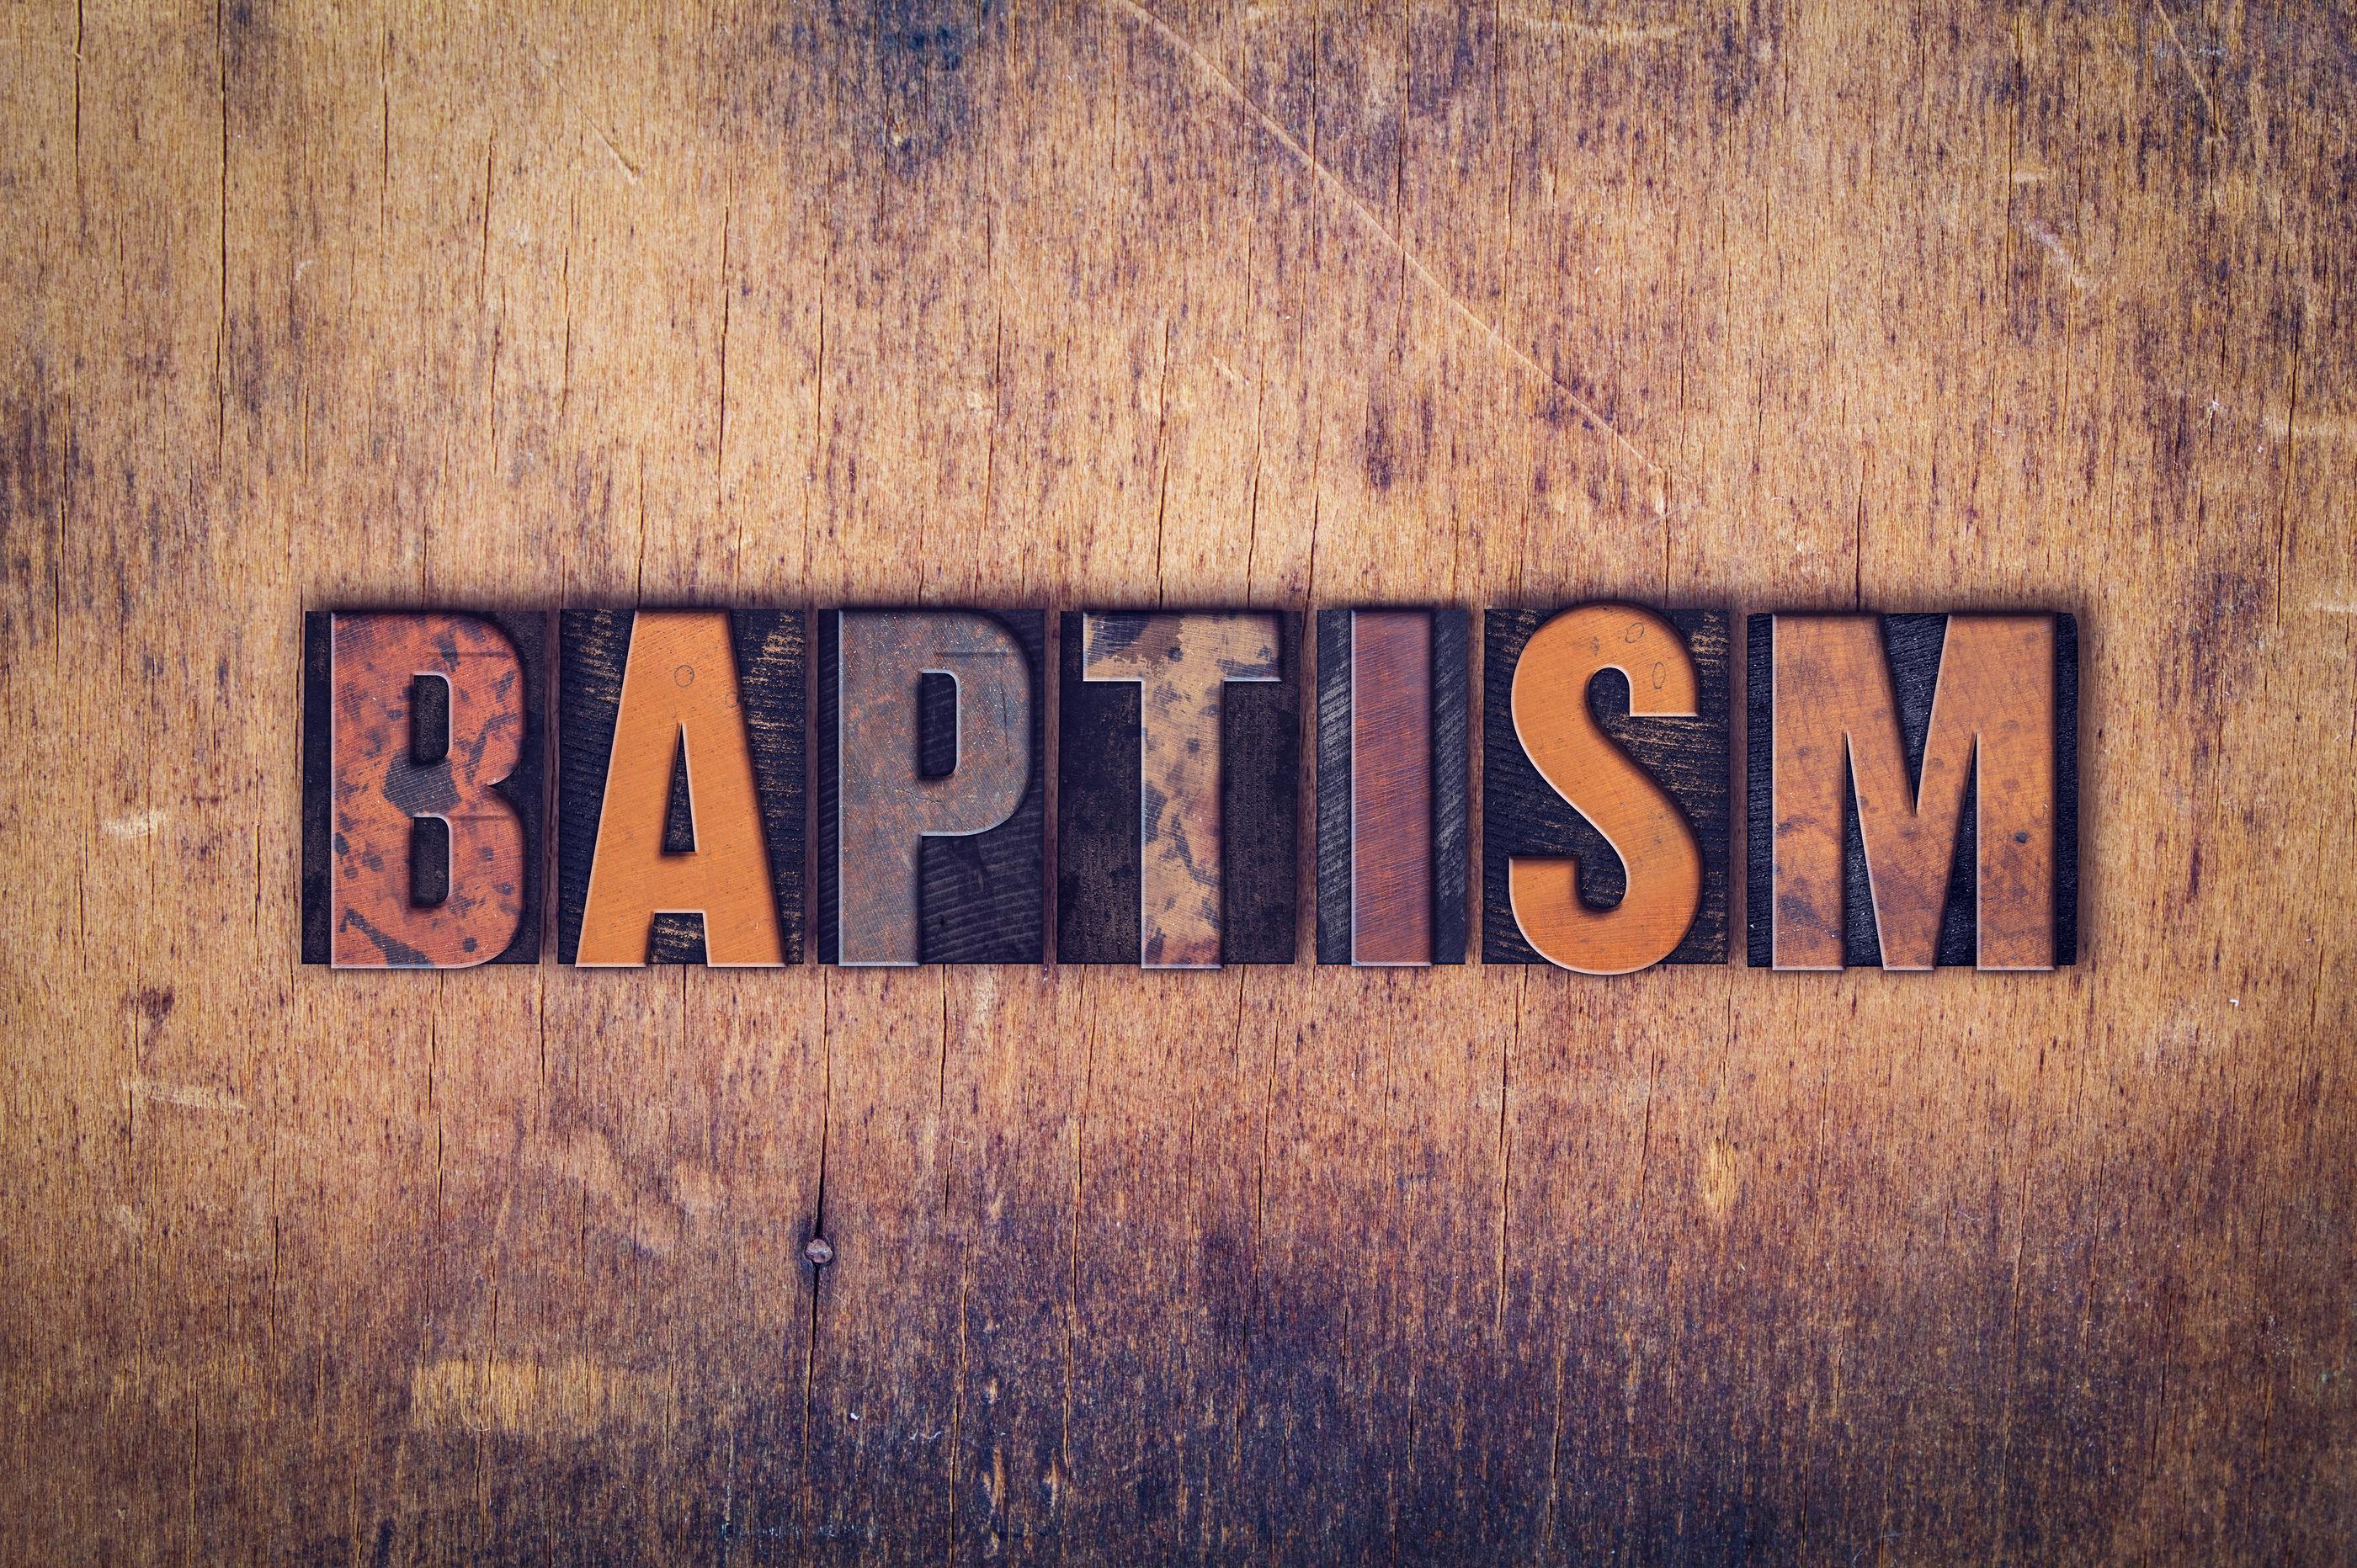 Baptism Concept Wooden Letterpress Type.